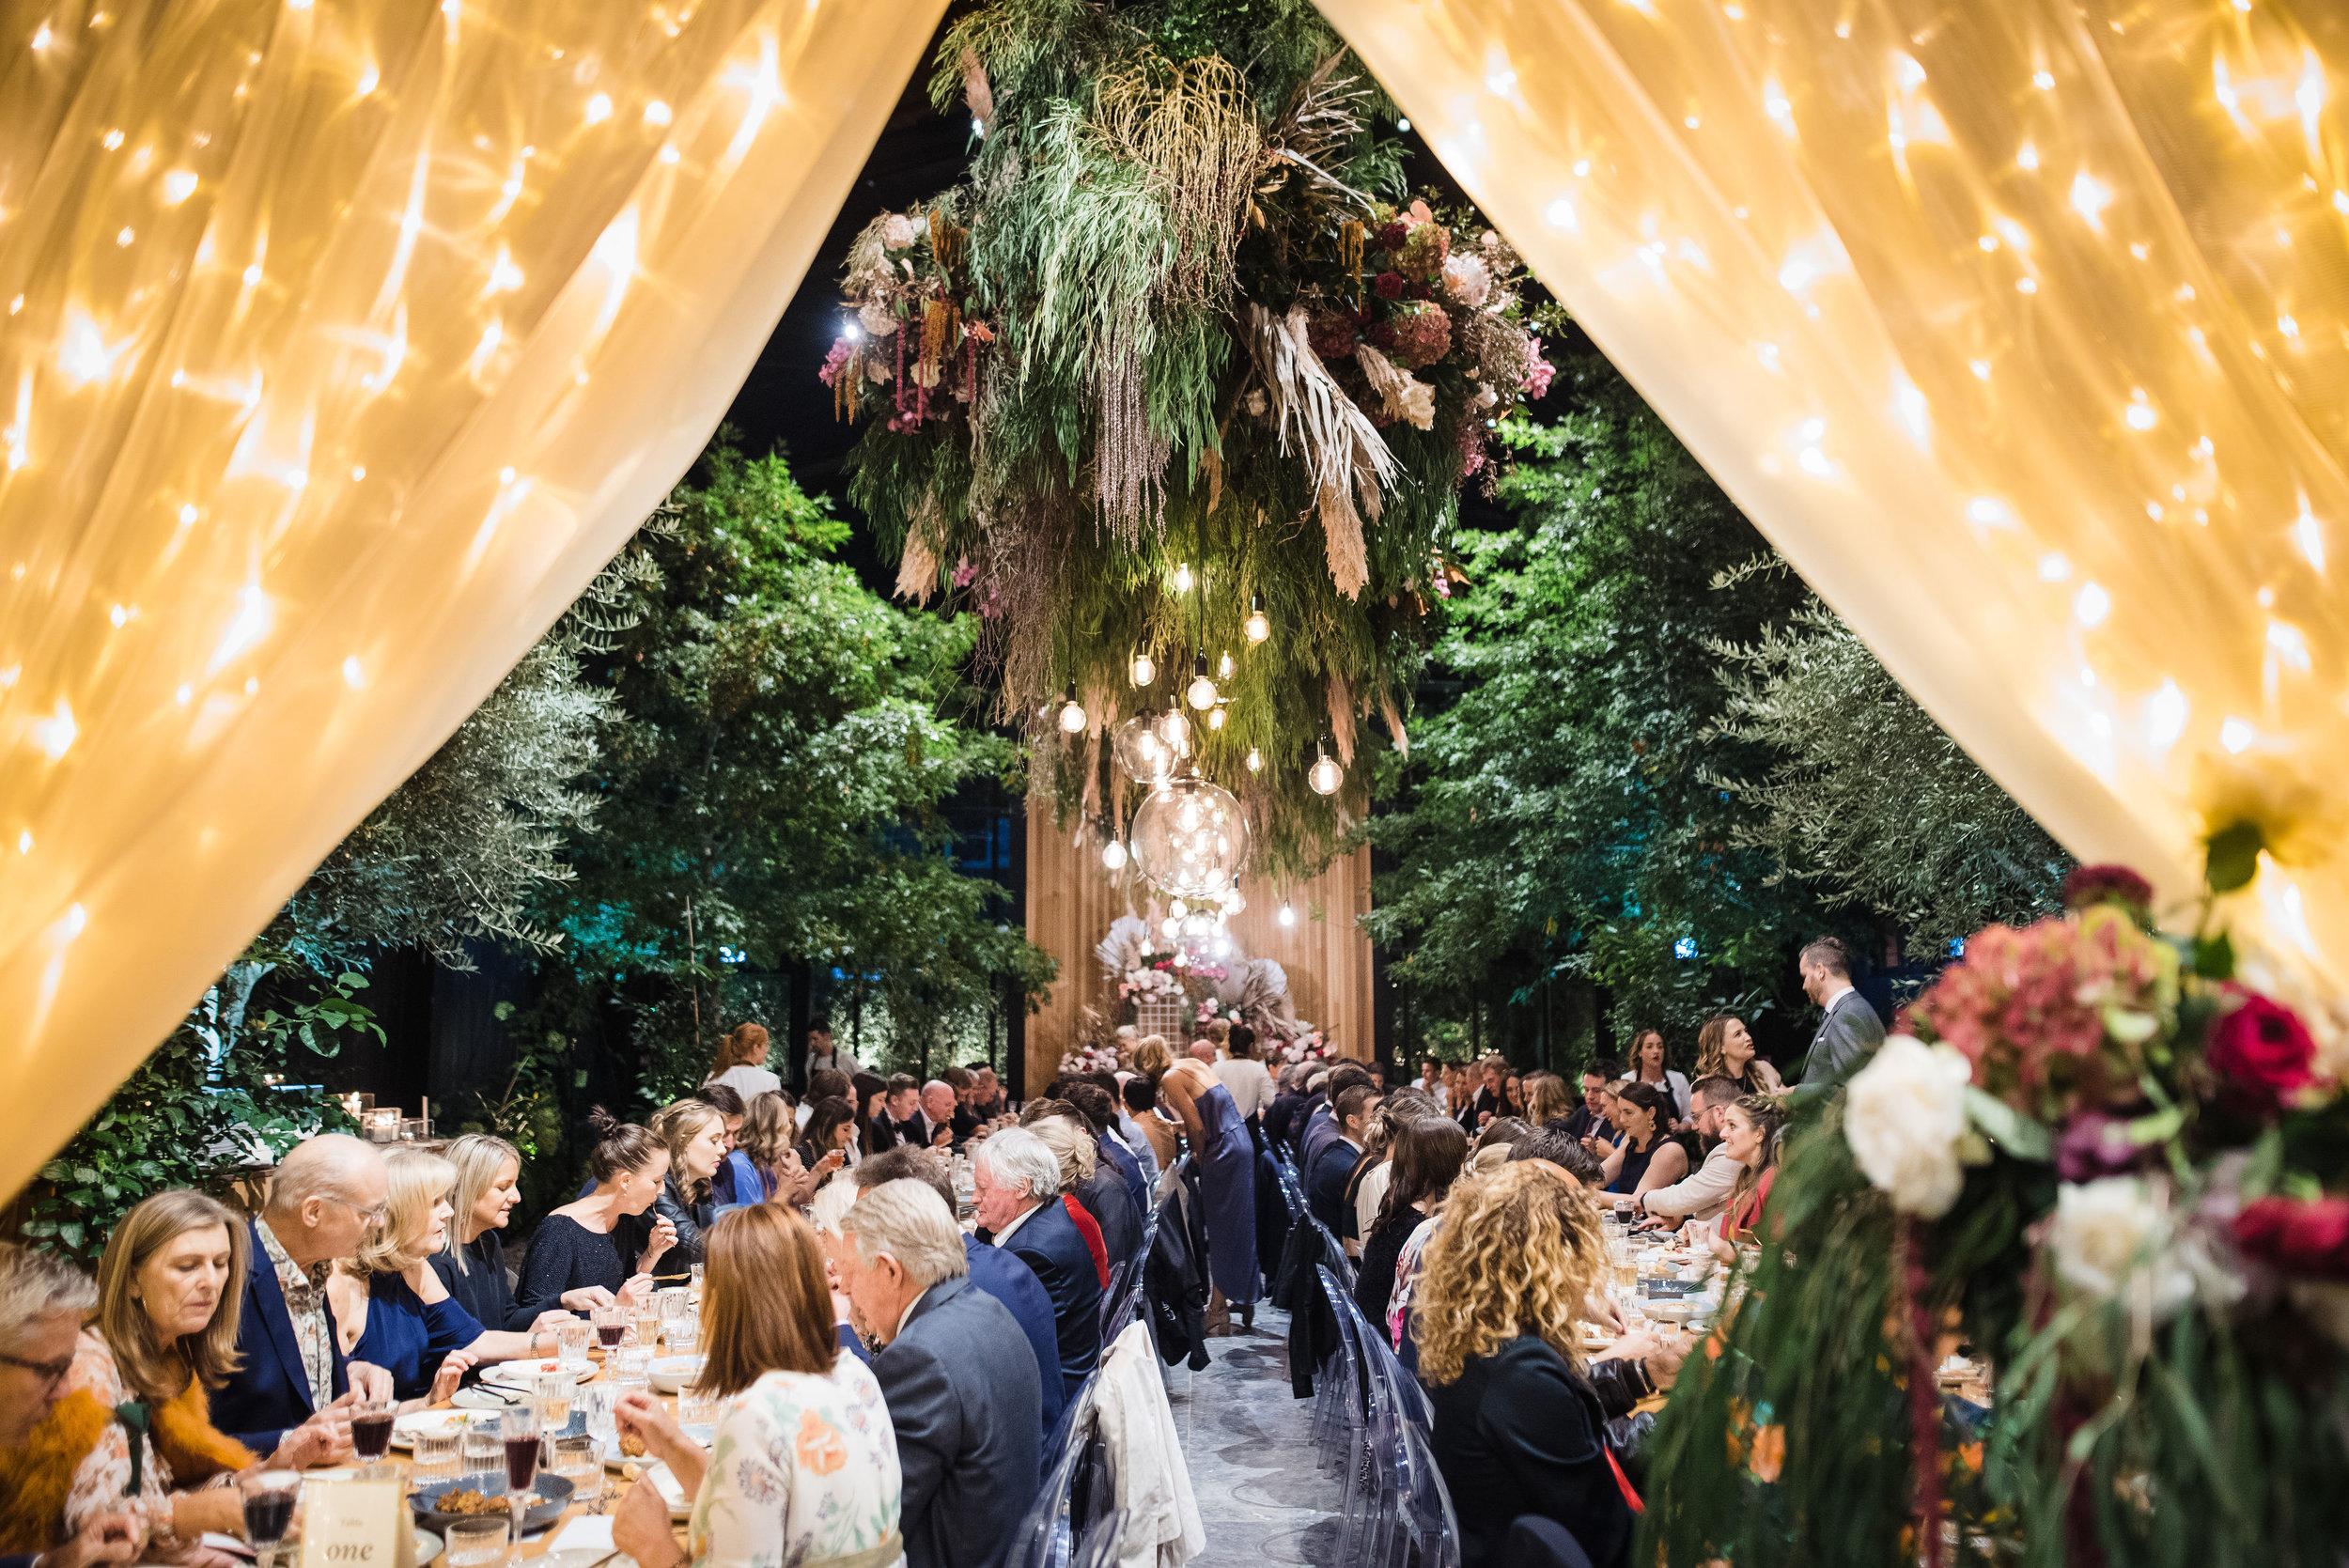 Zahn Trotter Wedding Photography    CONTACT ZAHN